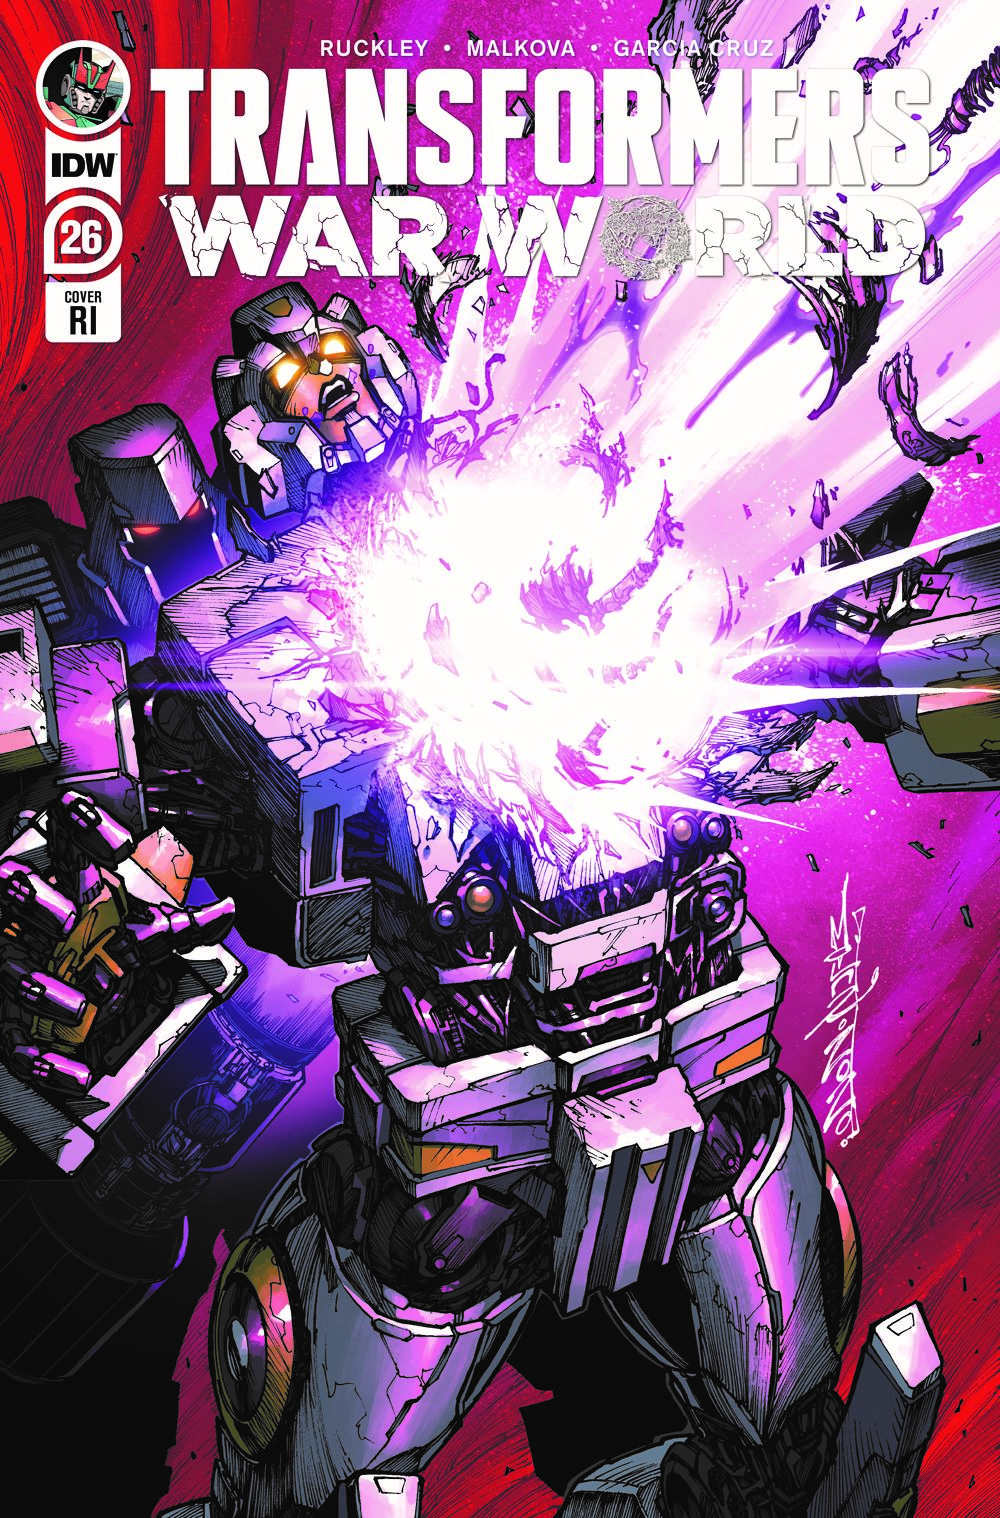 TF26-cvr-RI ComicList: IDW Publishing New Releases for 01/06/2021